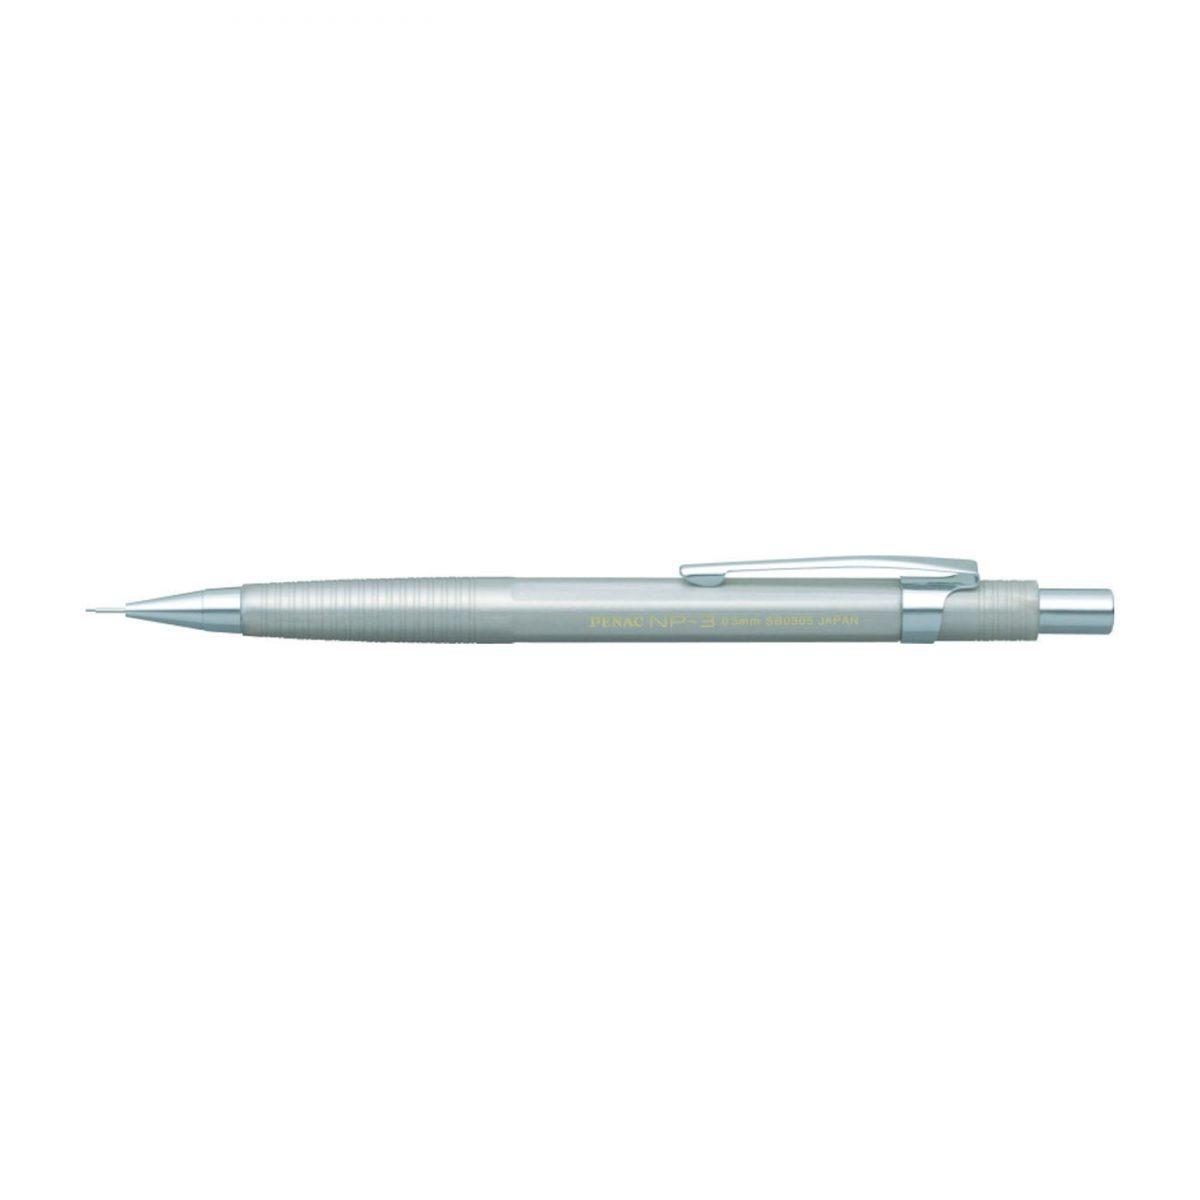 Creion mecanic profesional PENAC NP-3, 0.3mm, con metalic cu varf cilindric fix